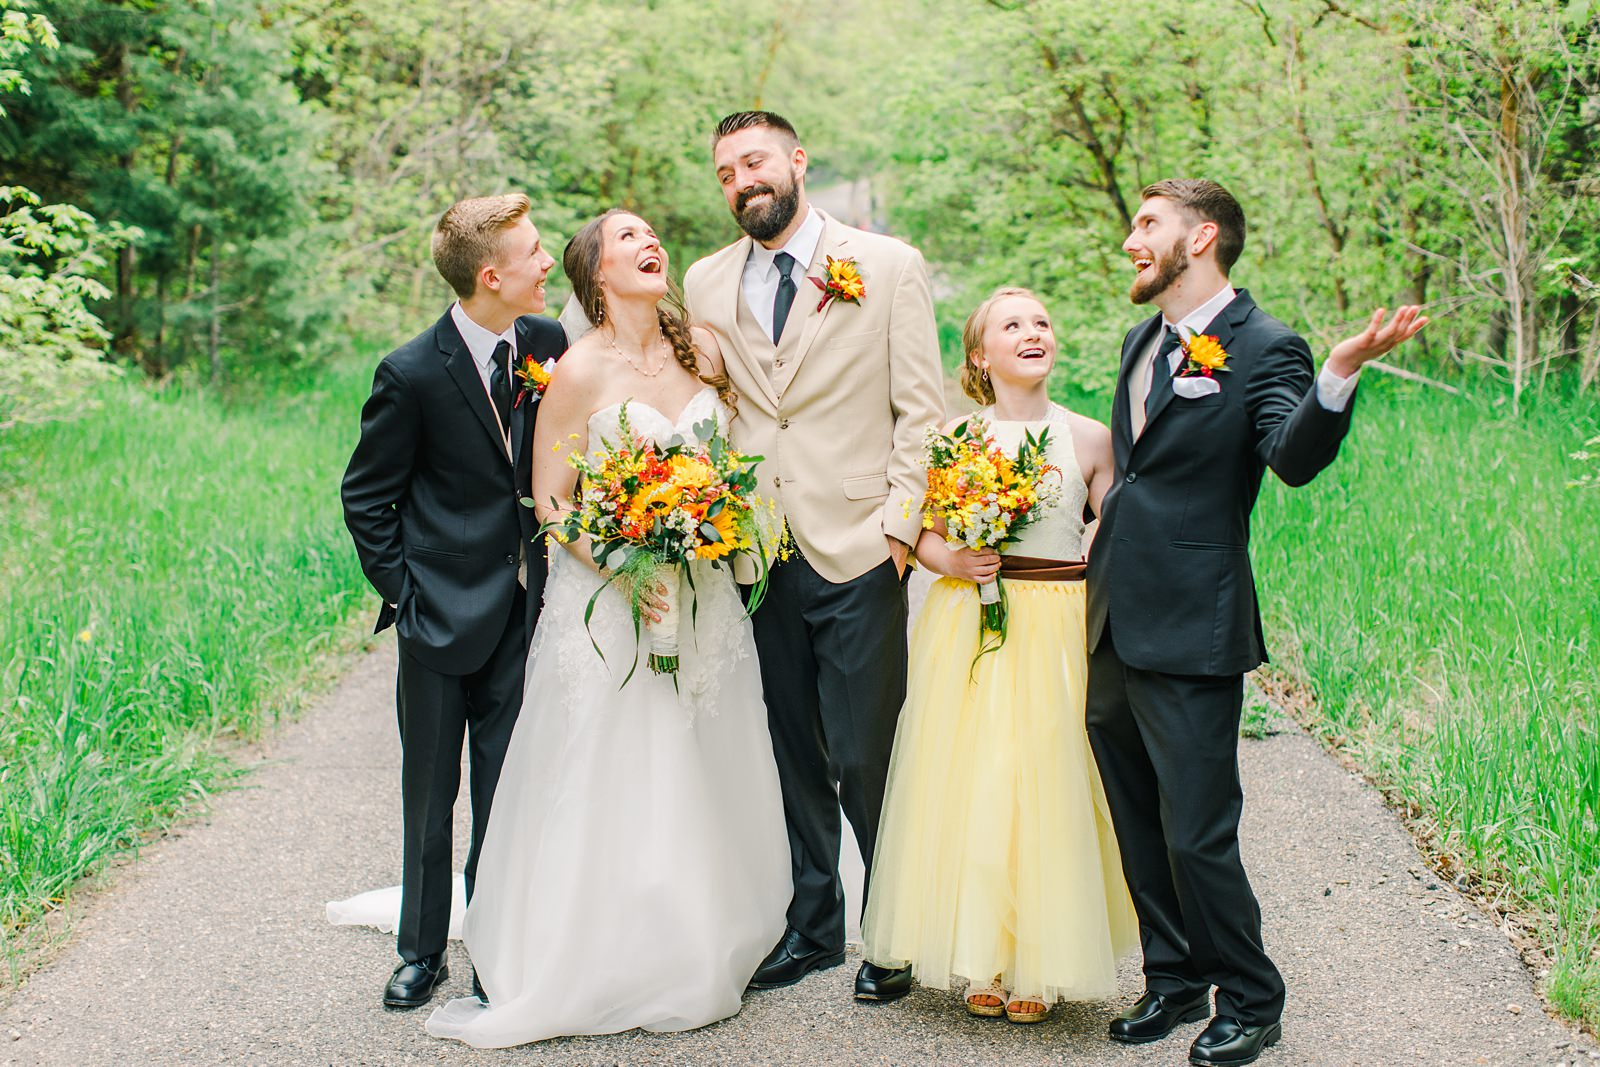 Millcreek Inn Summer Wedding, Utah wedding photography Millcreek Canyon, Salt Lake City, yellow bridesmaid dress, sunflower bouquet flowers